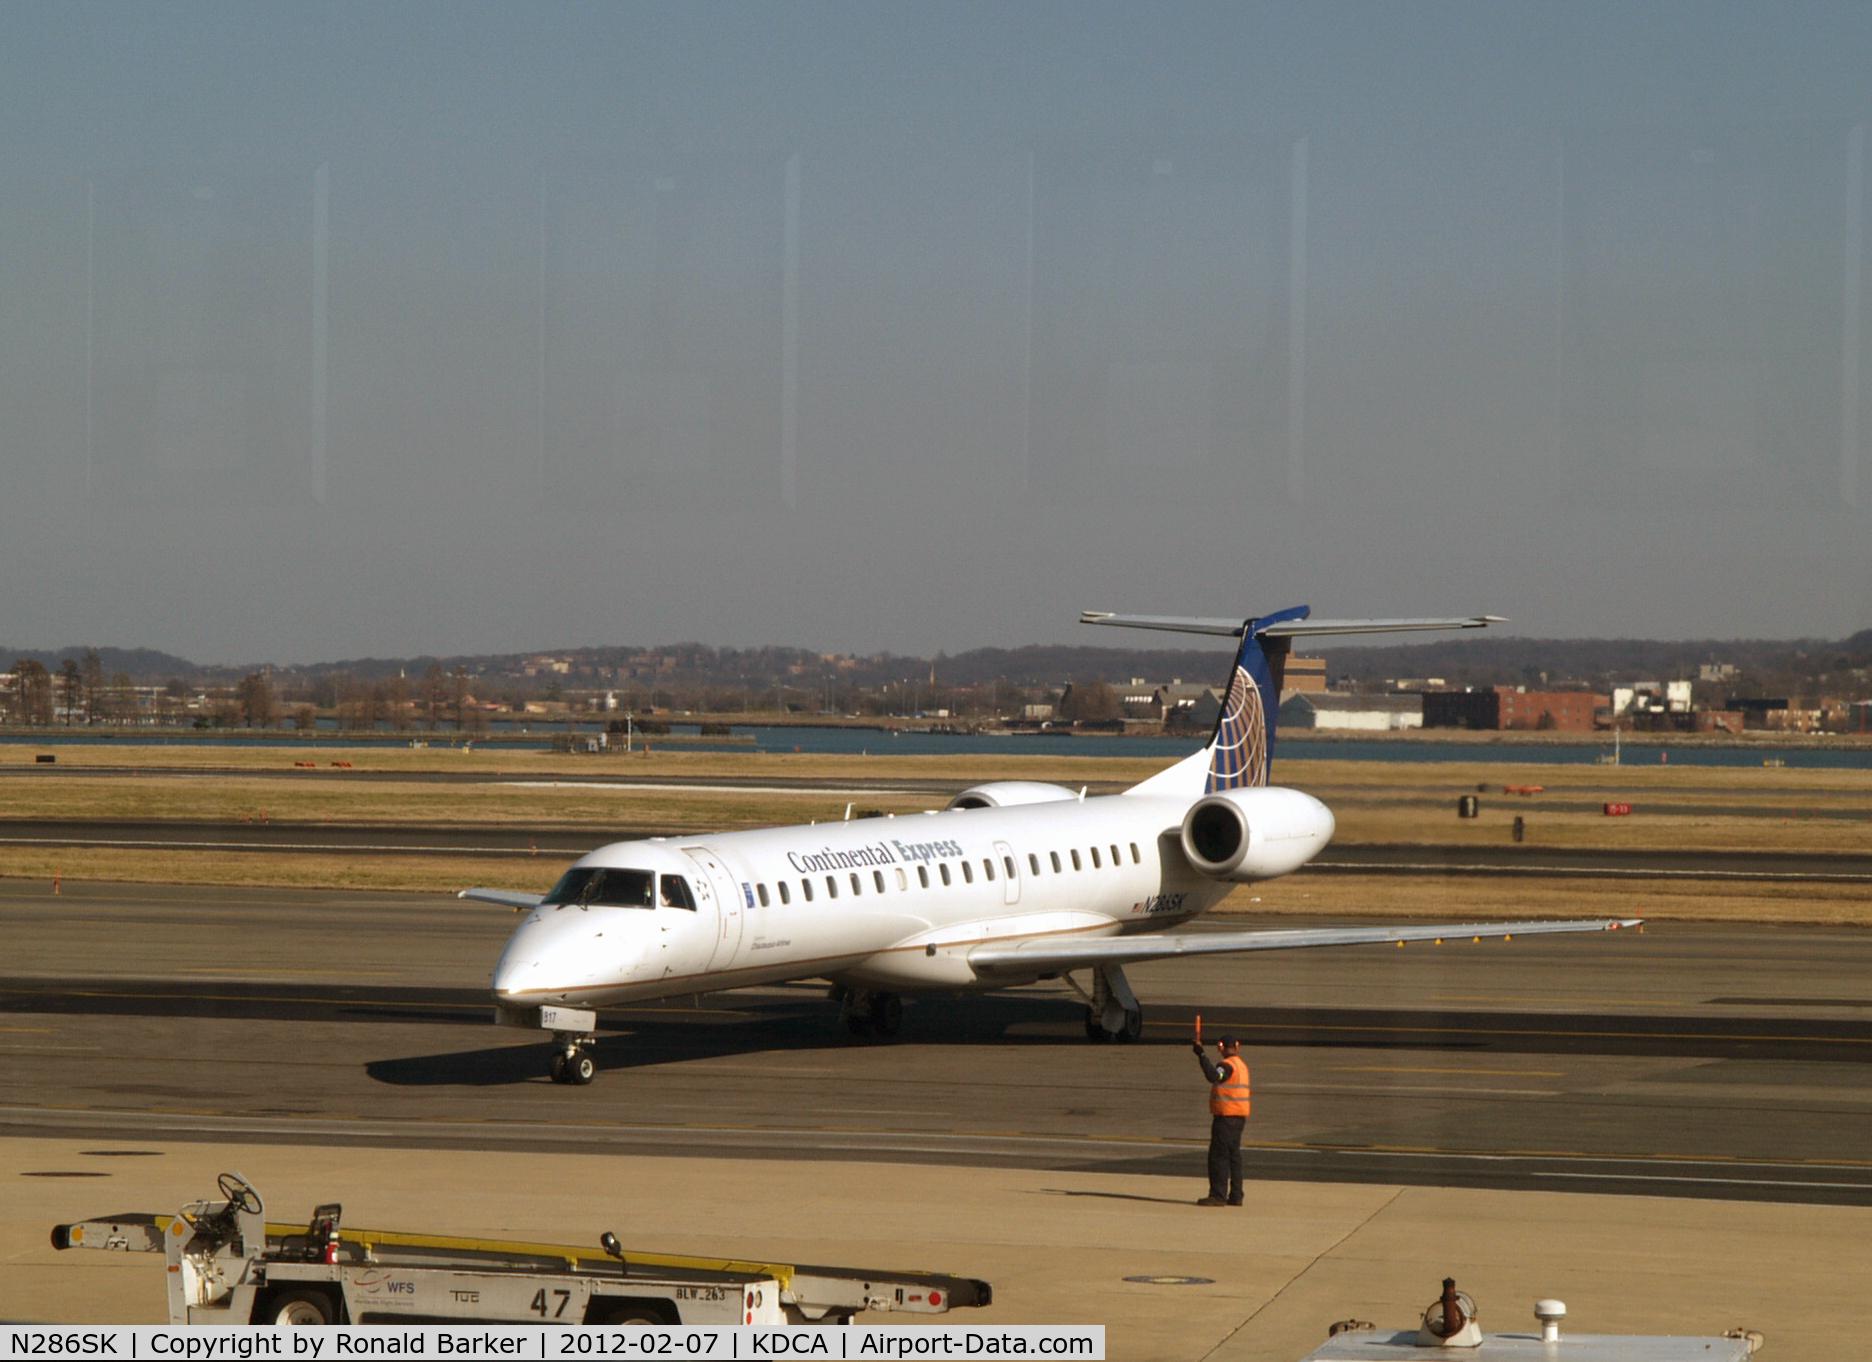 N286SK, 2001 Embraer EMB-145LR C/N 145443, DCA, VA